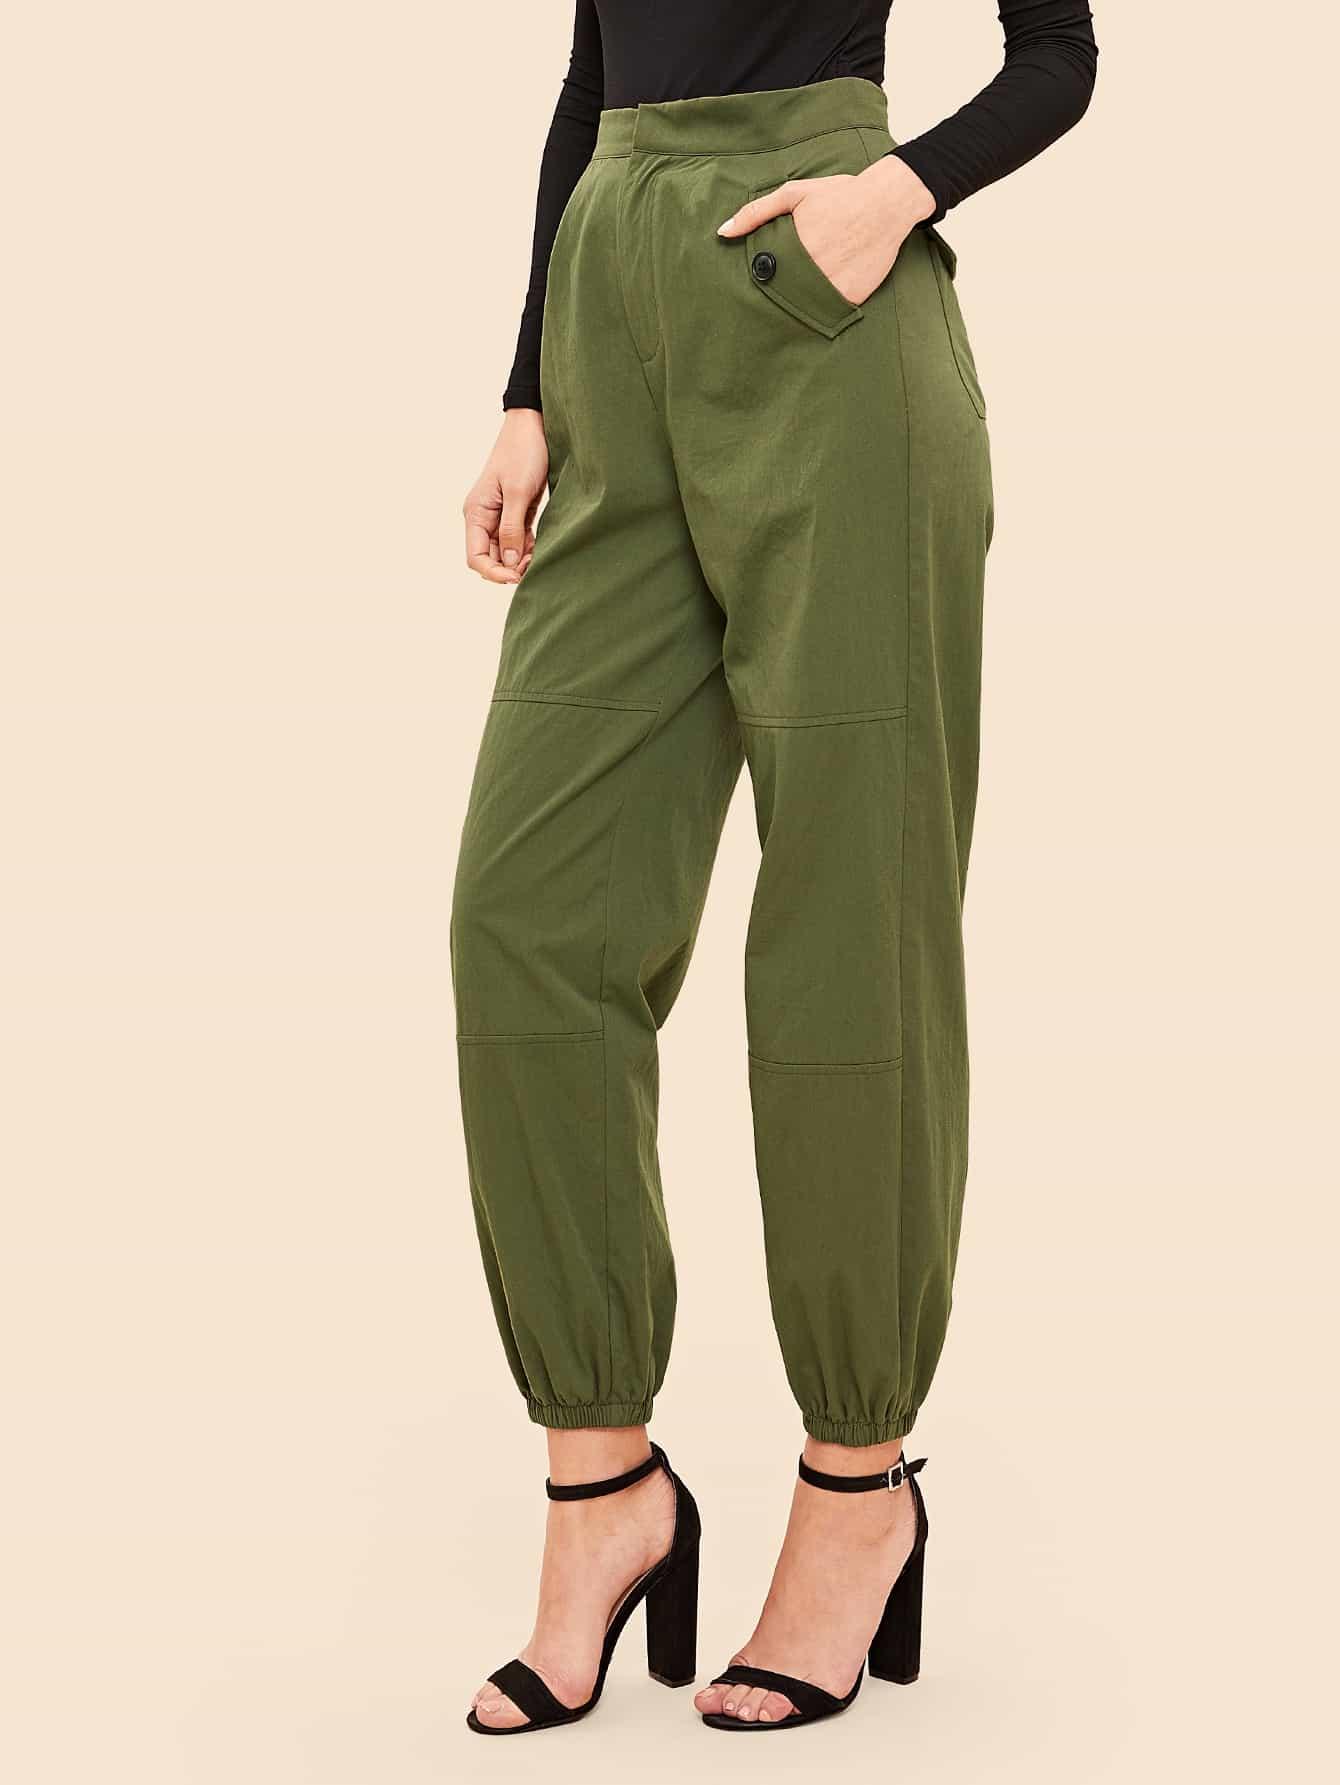 60s конические брюки с карманом thumbnail